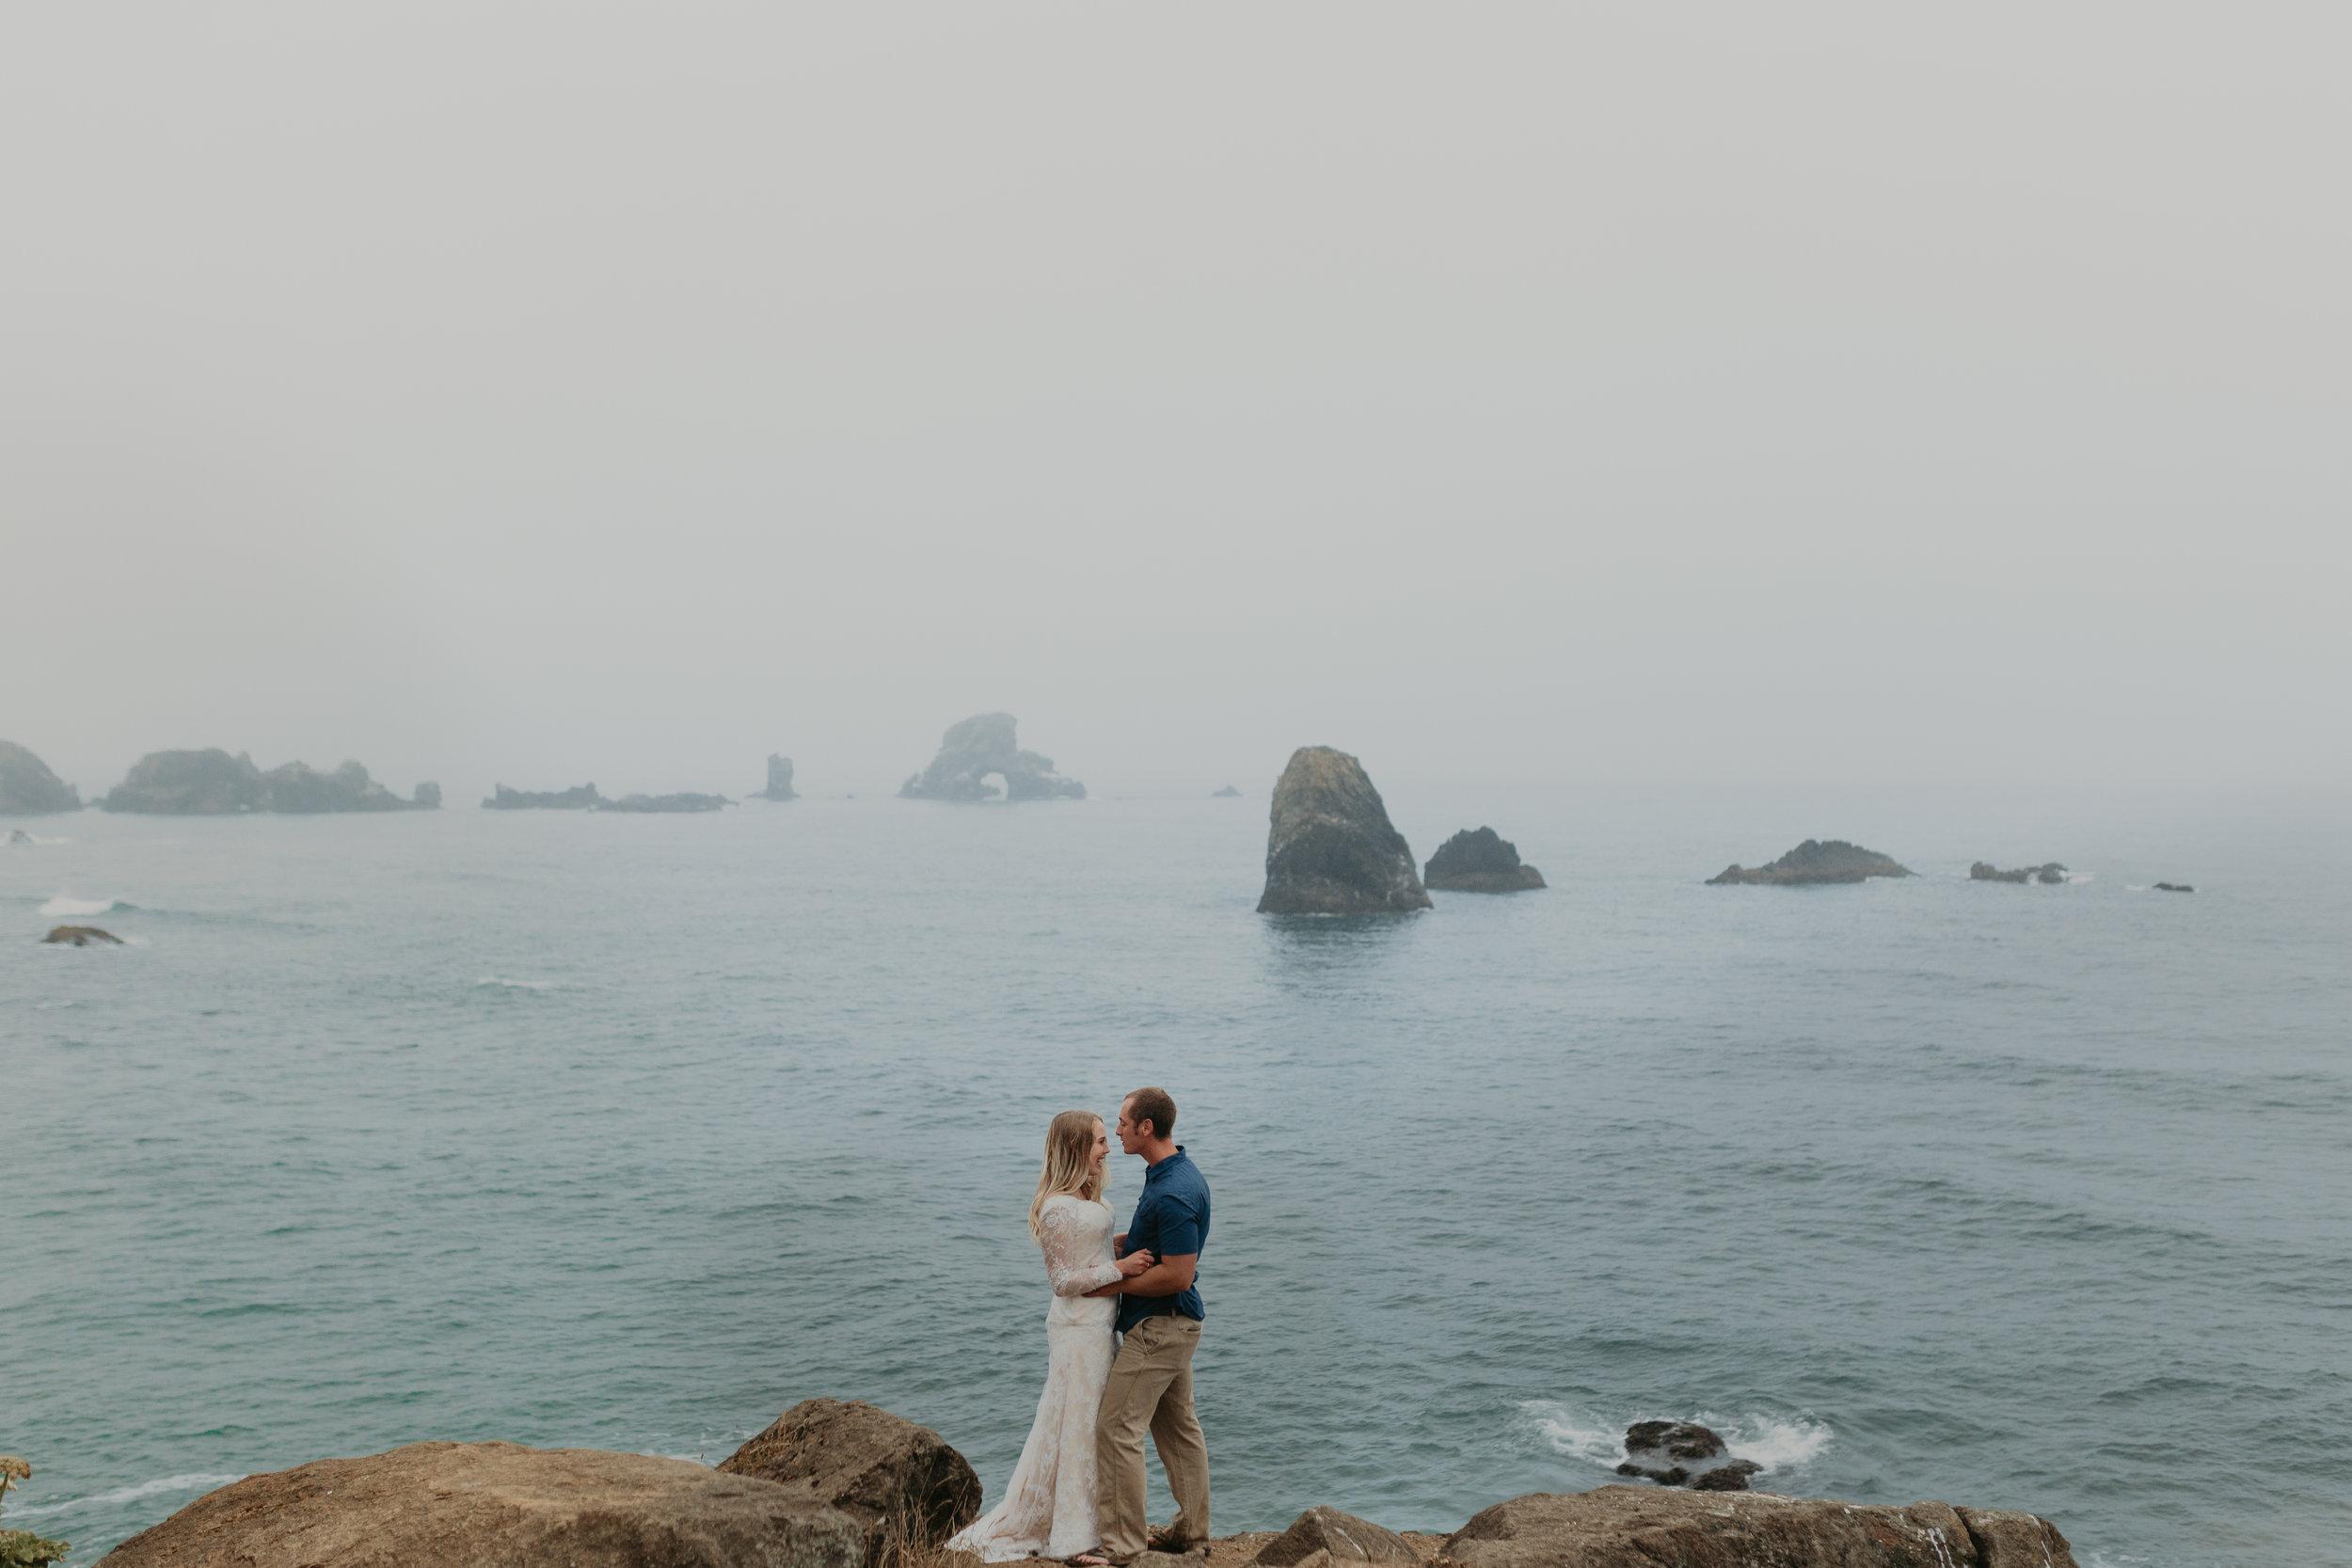 nicole-daacke-photography-ecola-state-park-oregon-elopement-bridal-photos-photographer-for-cannon-beach-elopement-oregon-coast-elopement-photographer-foggy-summer-elopement-cannon-beach-best-adventure-elopement-photographer-6985.jpg